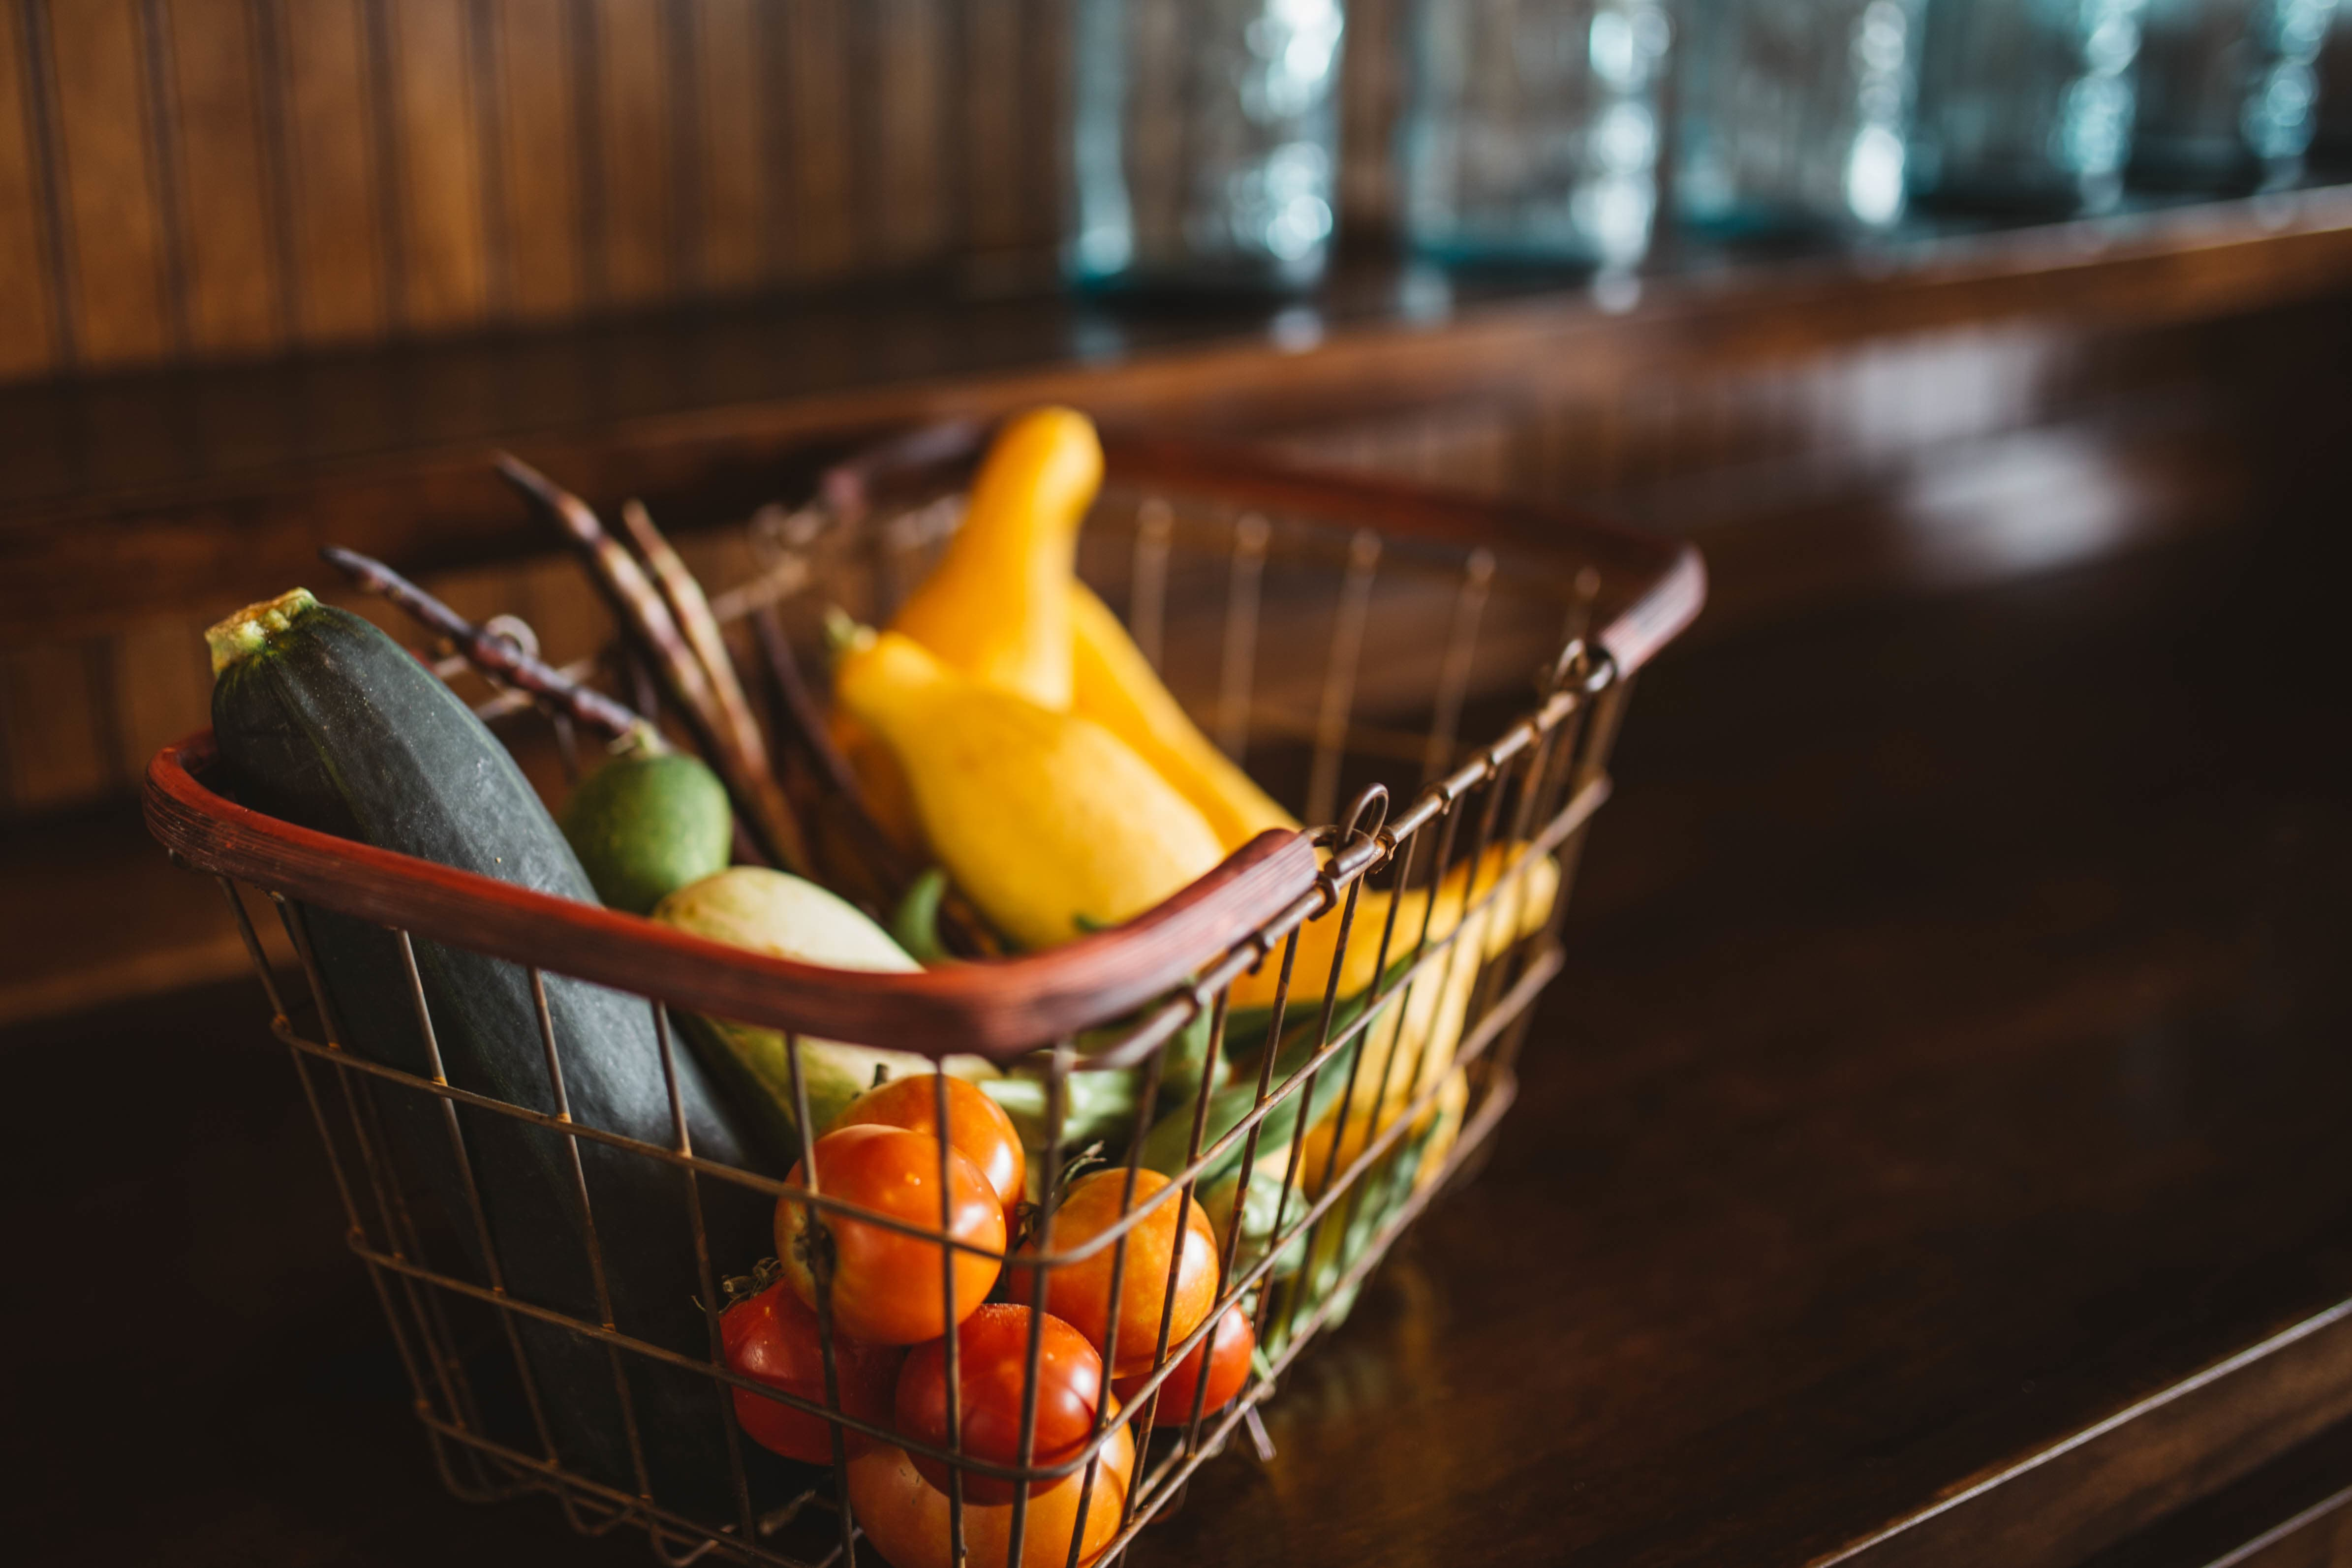 Stagionalità frutta e verdura: perchè è importante?